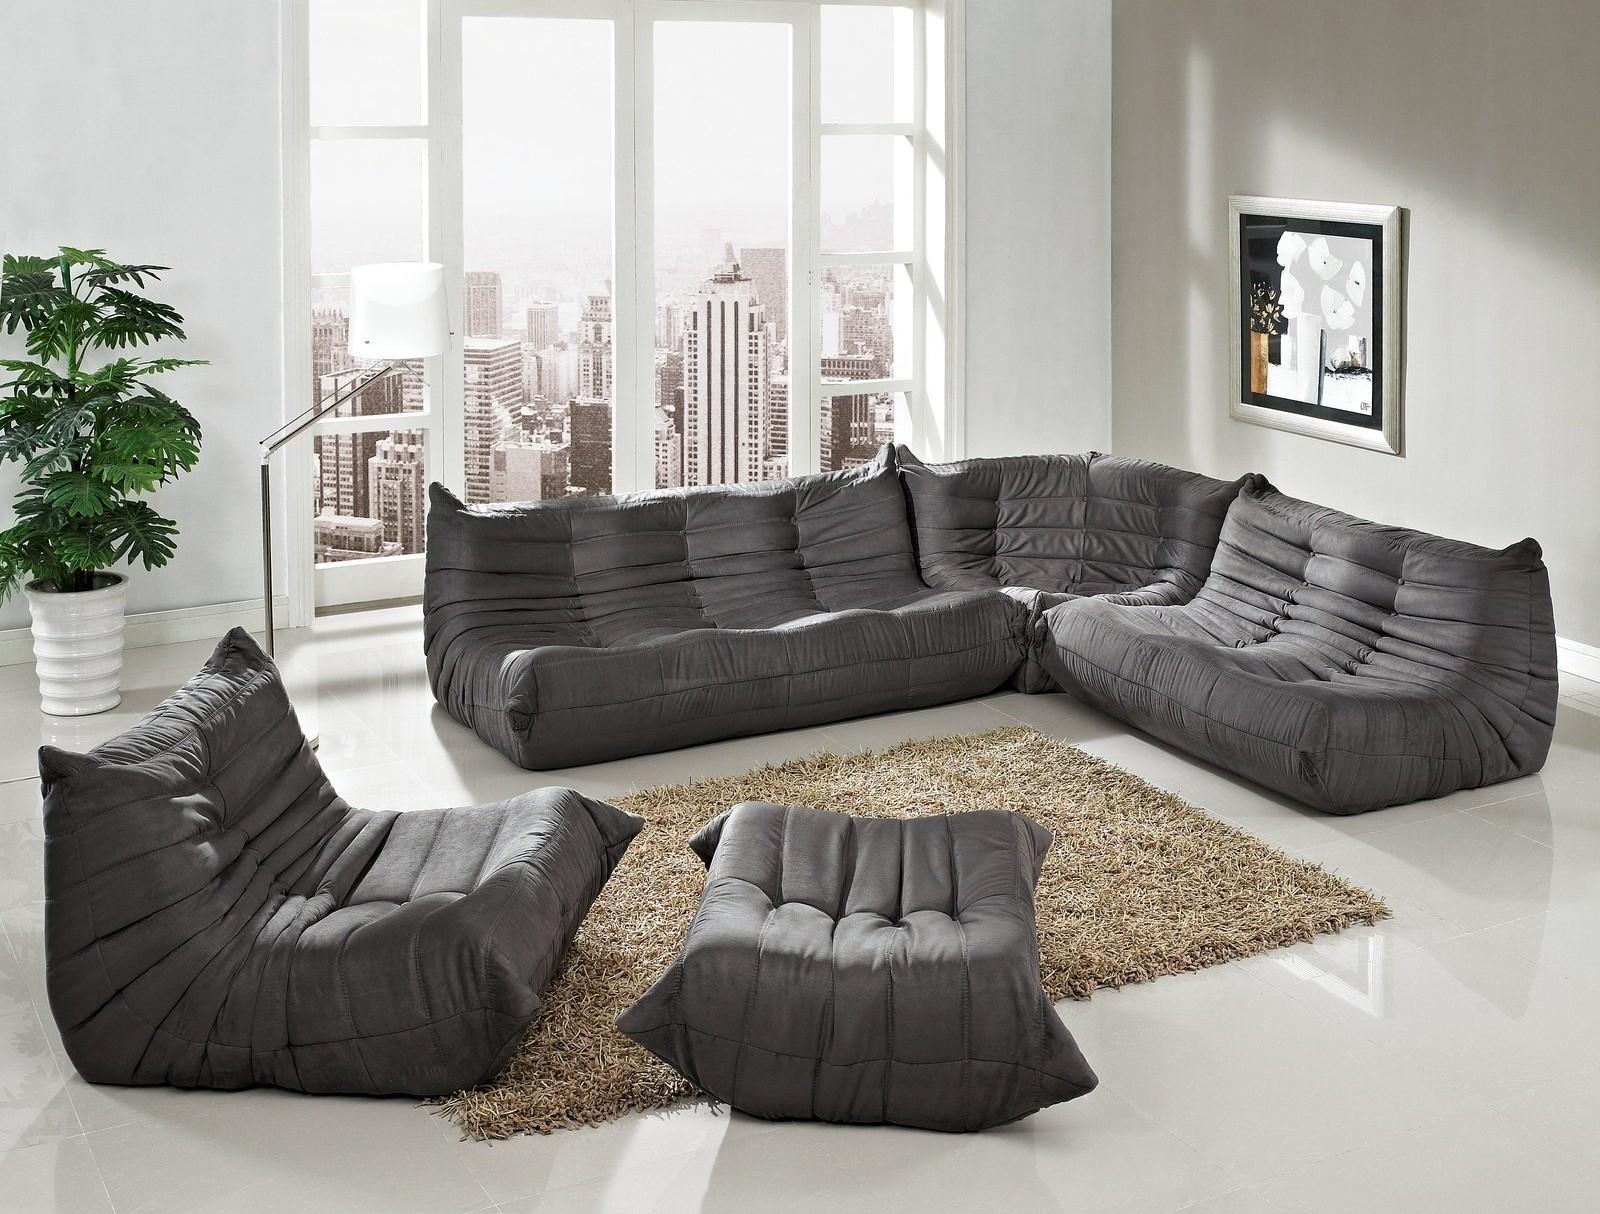 waverunner modular sectional sofa set in light gray 5 pieces